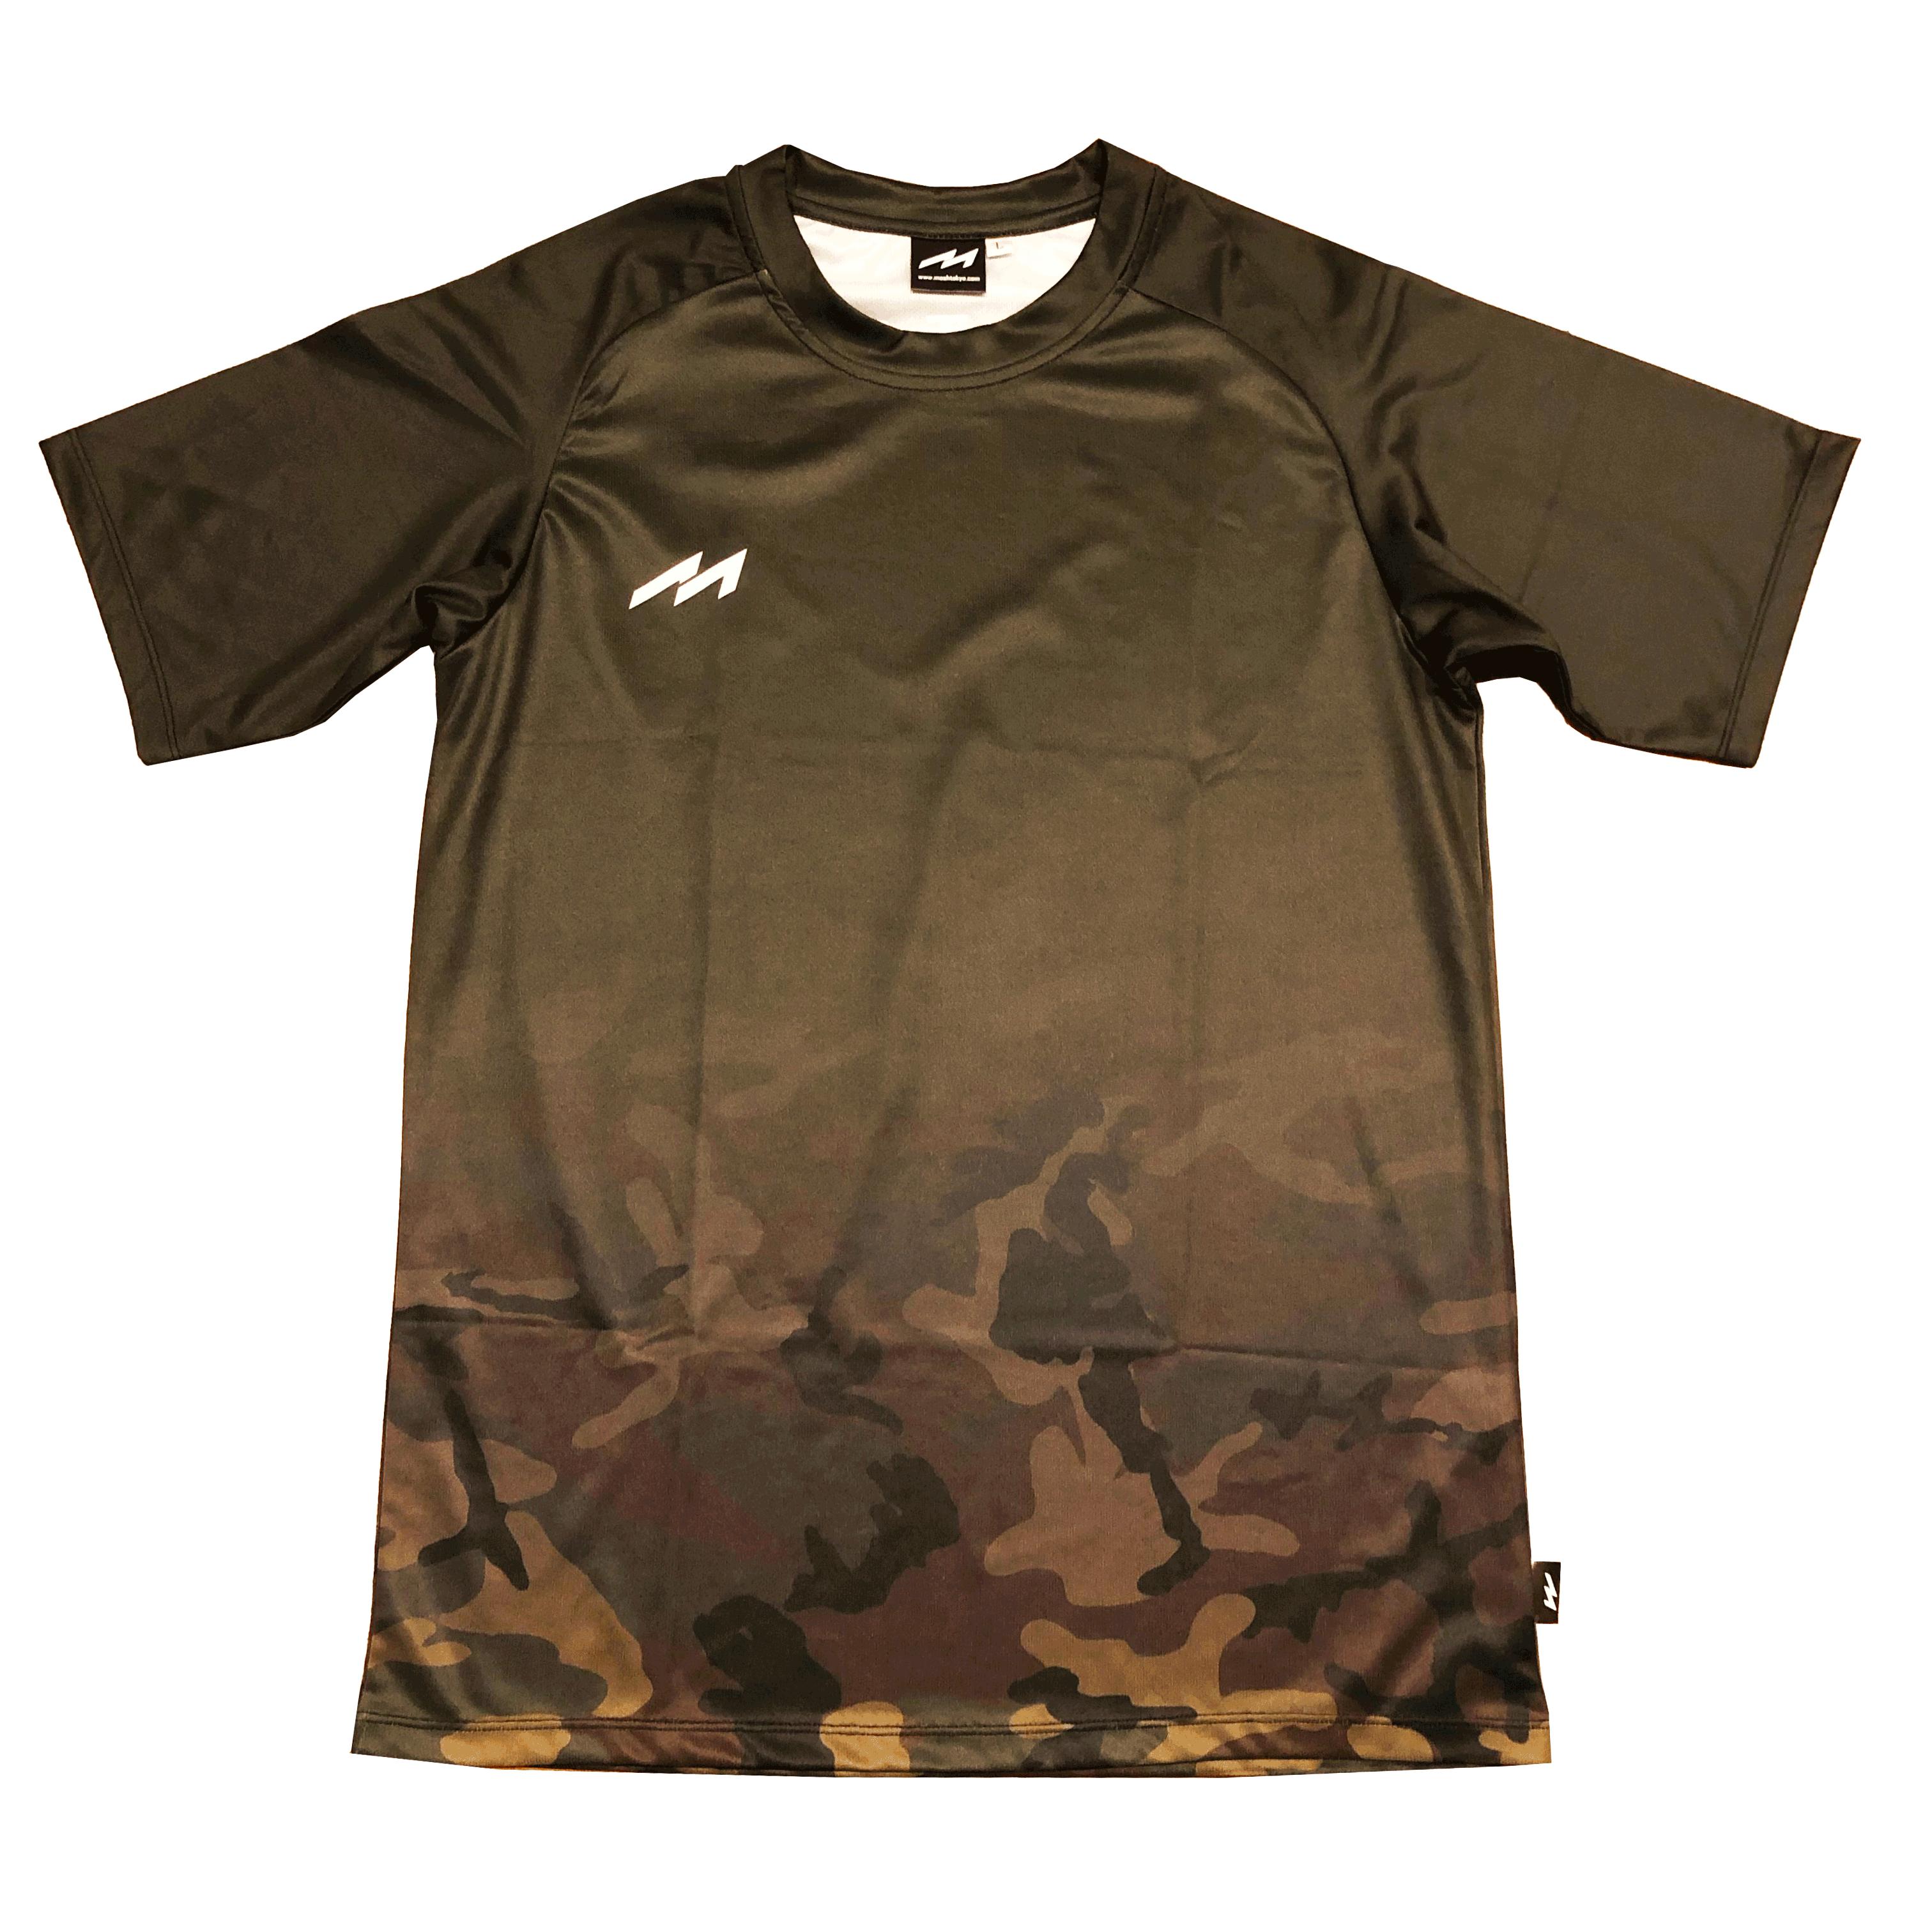 Fade Camo Shirts (MHS-2013 D-GRN)